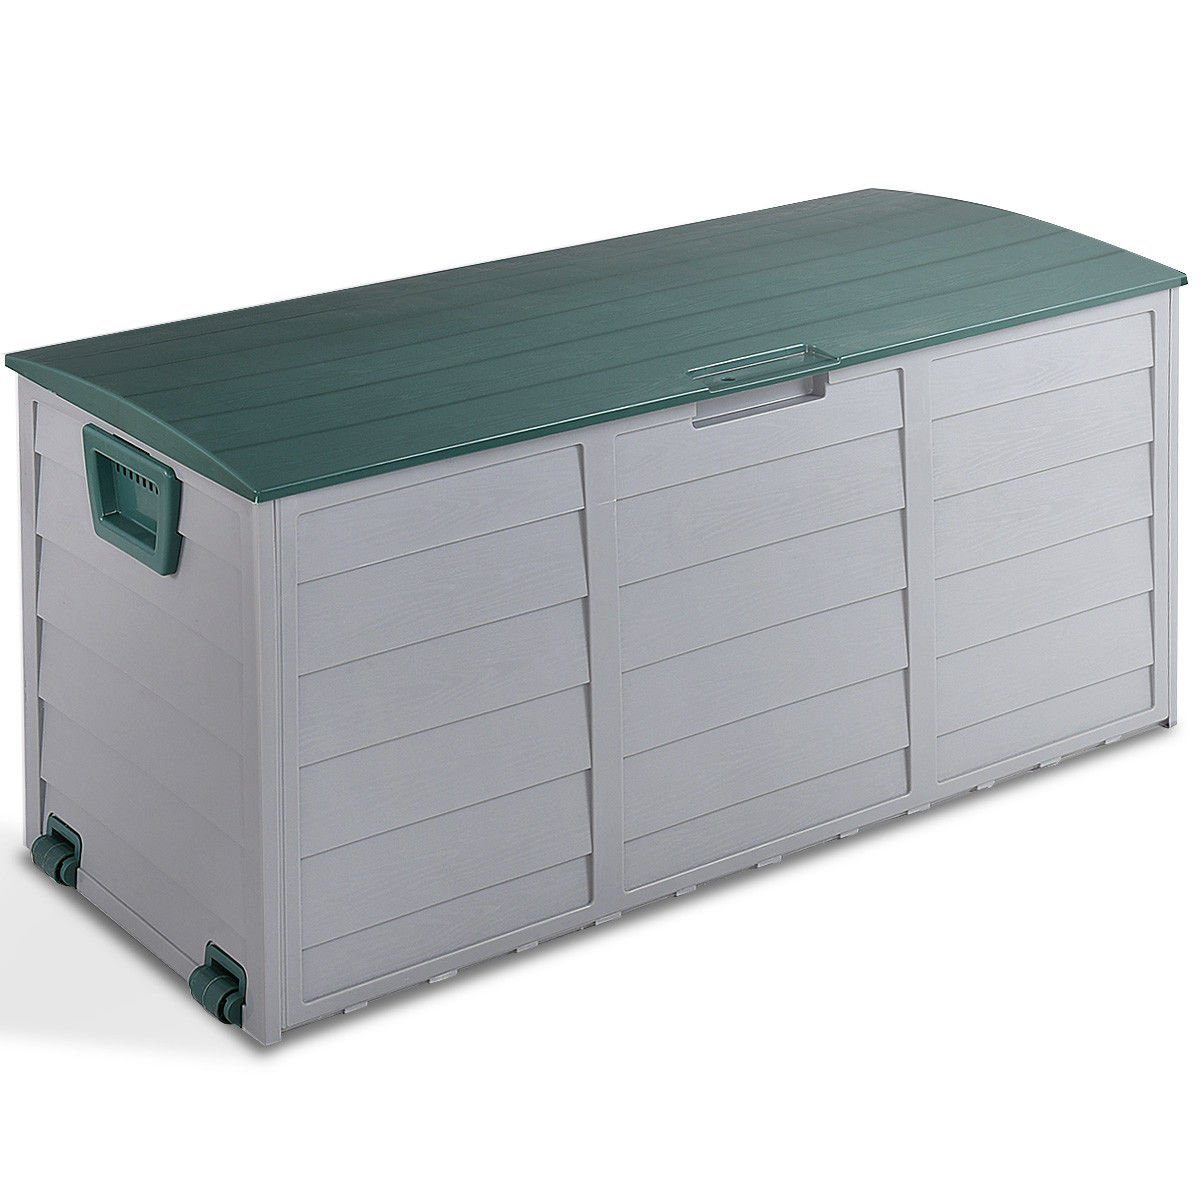 Globe House Products GHP 44''x20''x22'' Gray & Green 7-Gallon Capacity Patio Garage Deck Storage Bench